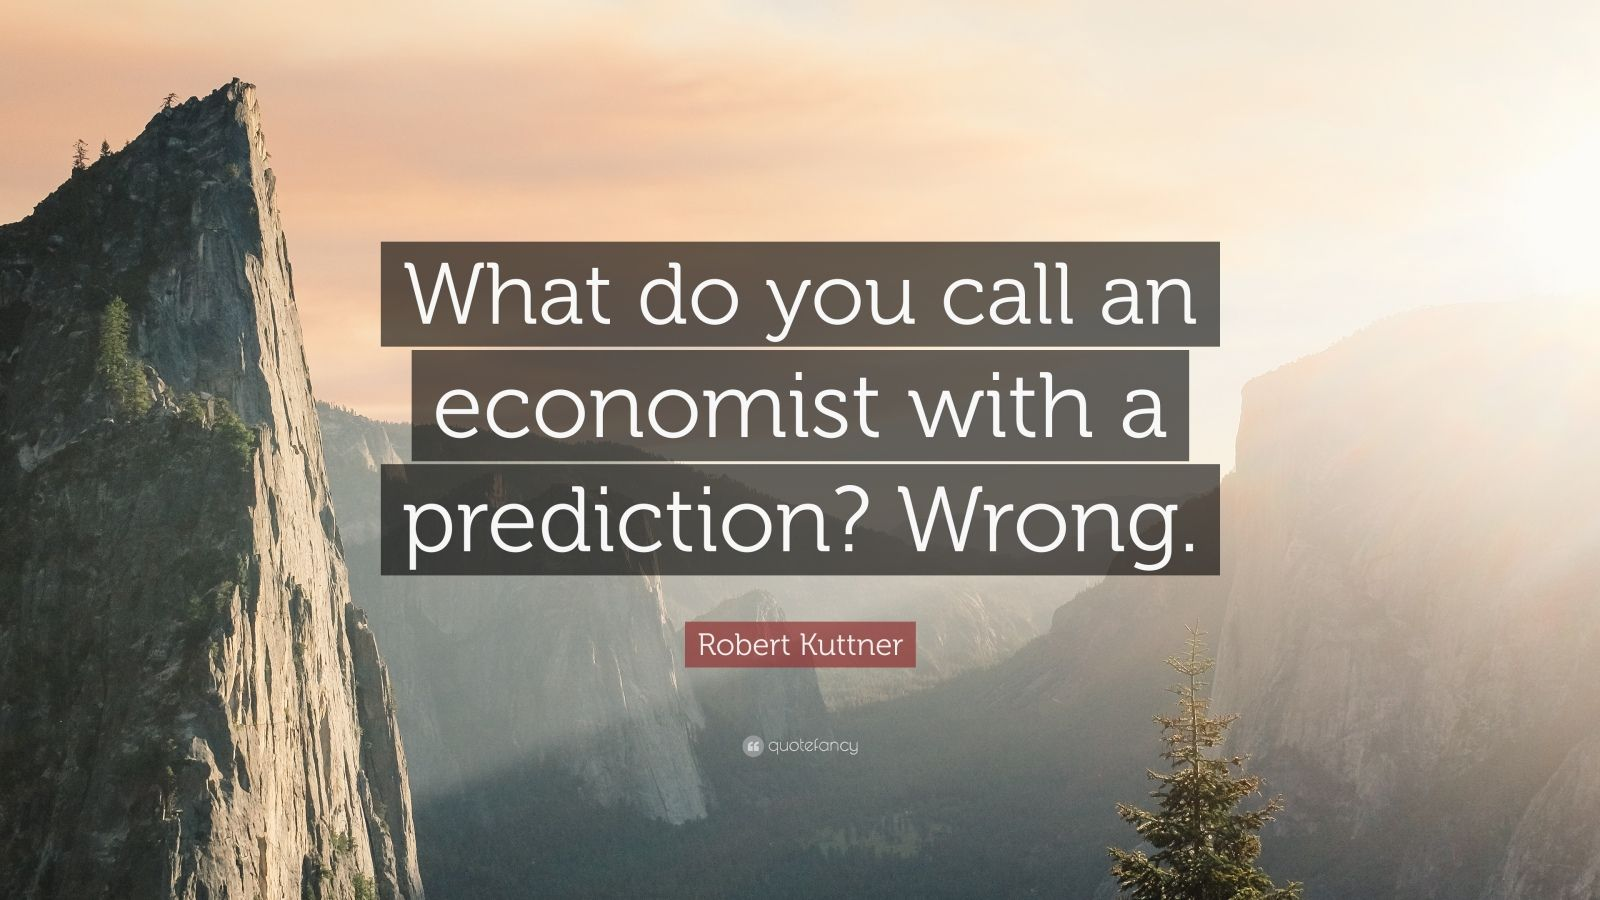 what economist do robert lucas Suggested citation robert e lucas jr, 2011 what economists do, journal of applied economics, universidad del cema, vol 14, pages 1-4, may handle: repec:cem:jaecon:v:14:y:2011:n:1:p:1-4 as html, html with abstract, plain text, plain text with abstract, bibtex, ris (endnote, refman, procite), redif, json.